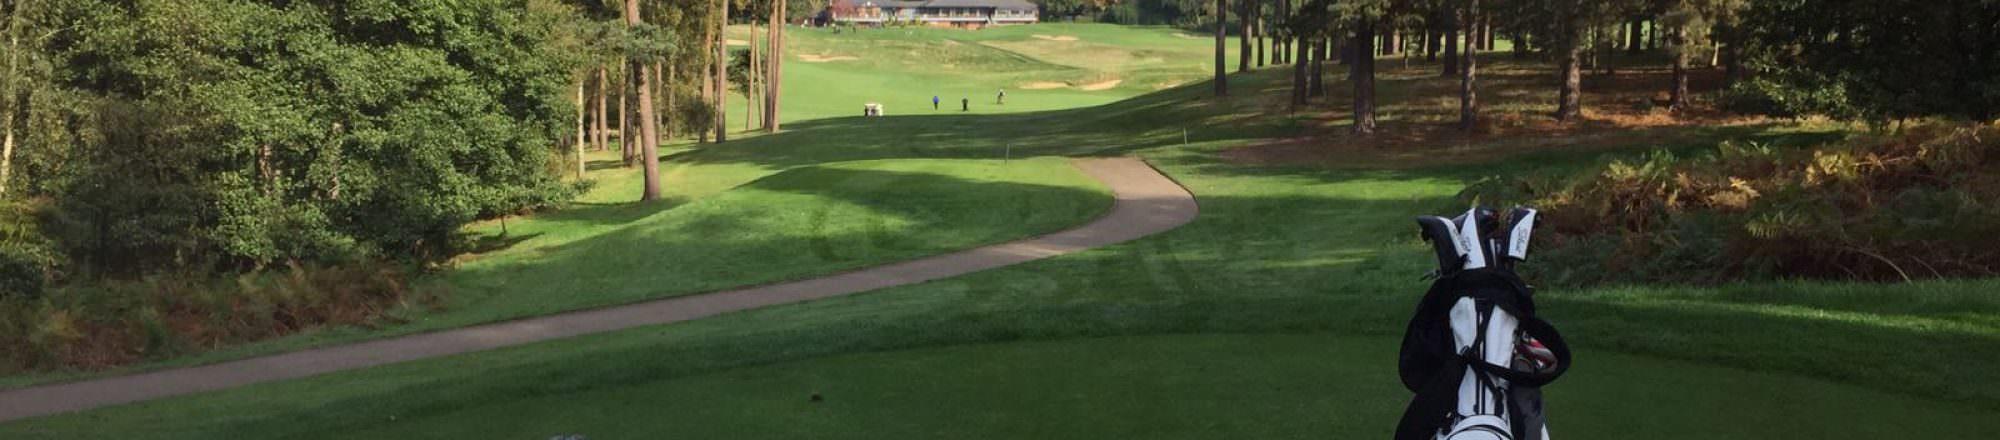 Played By NCG: Bearwood Lakes Golf Club